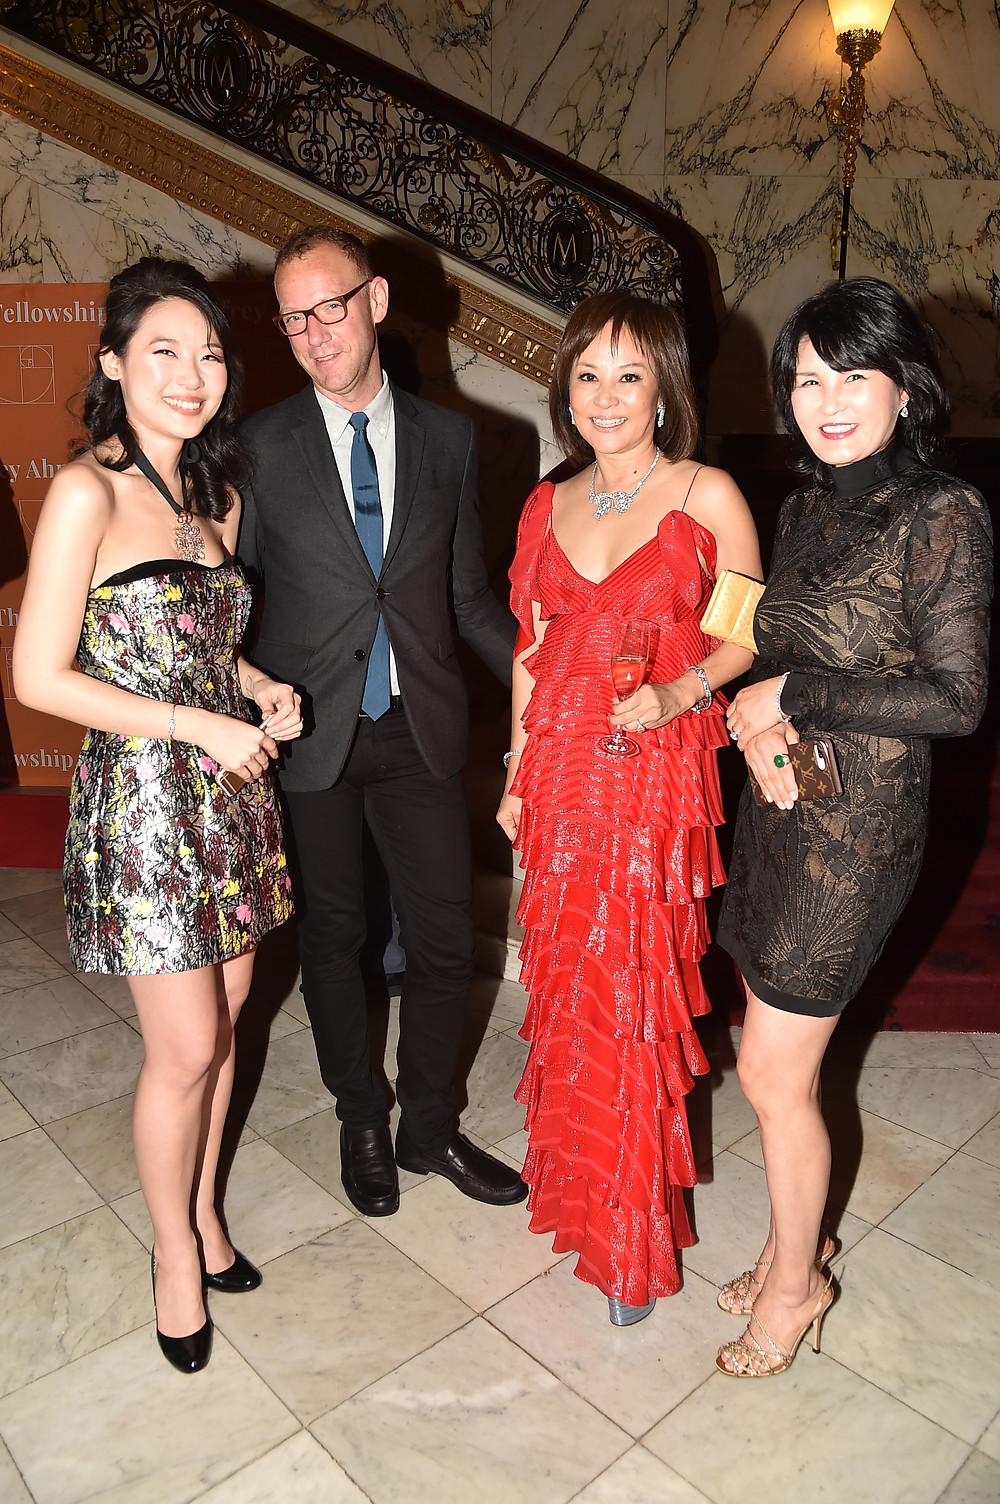 Presca Ahn, Ian Alteveer, Priscilla Ahn, Shinkyung Kim